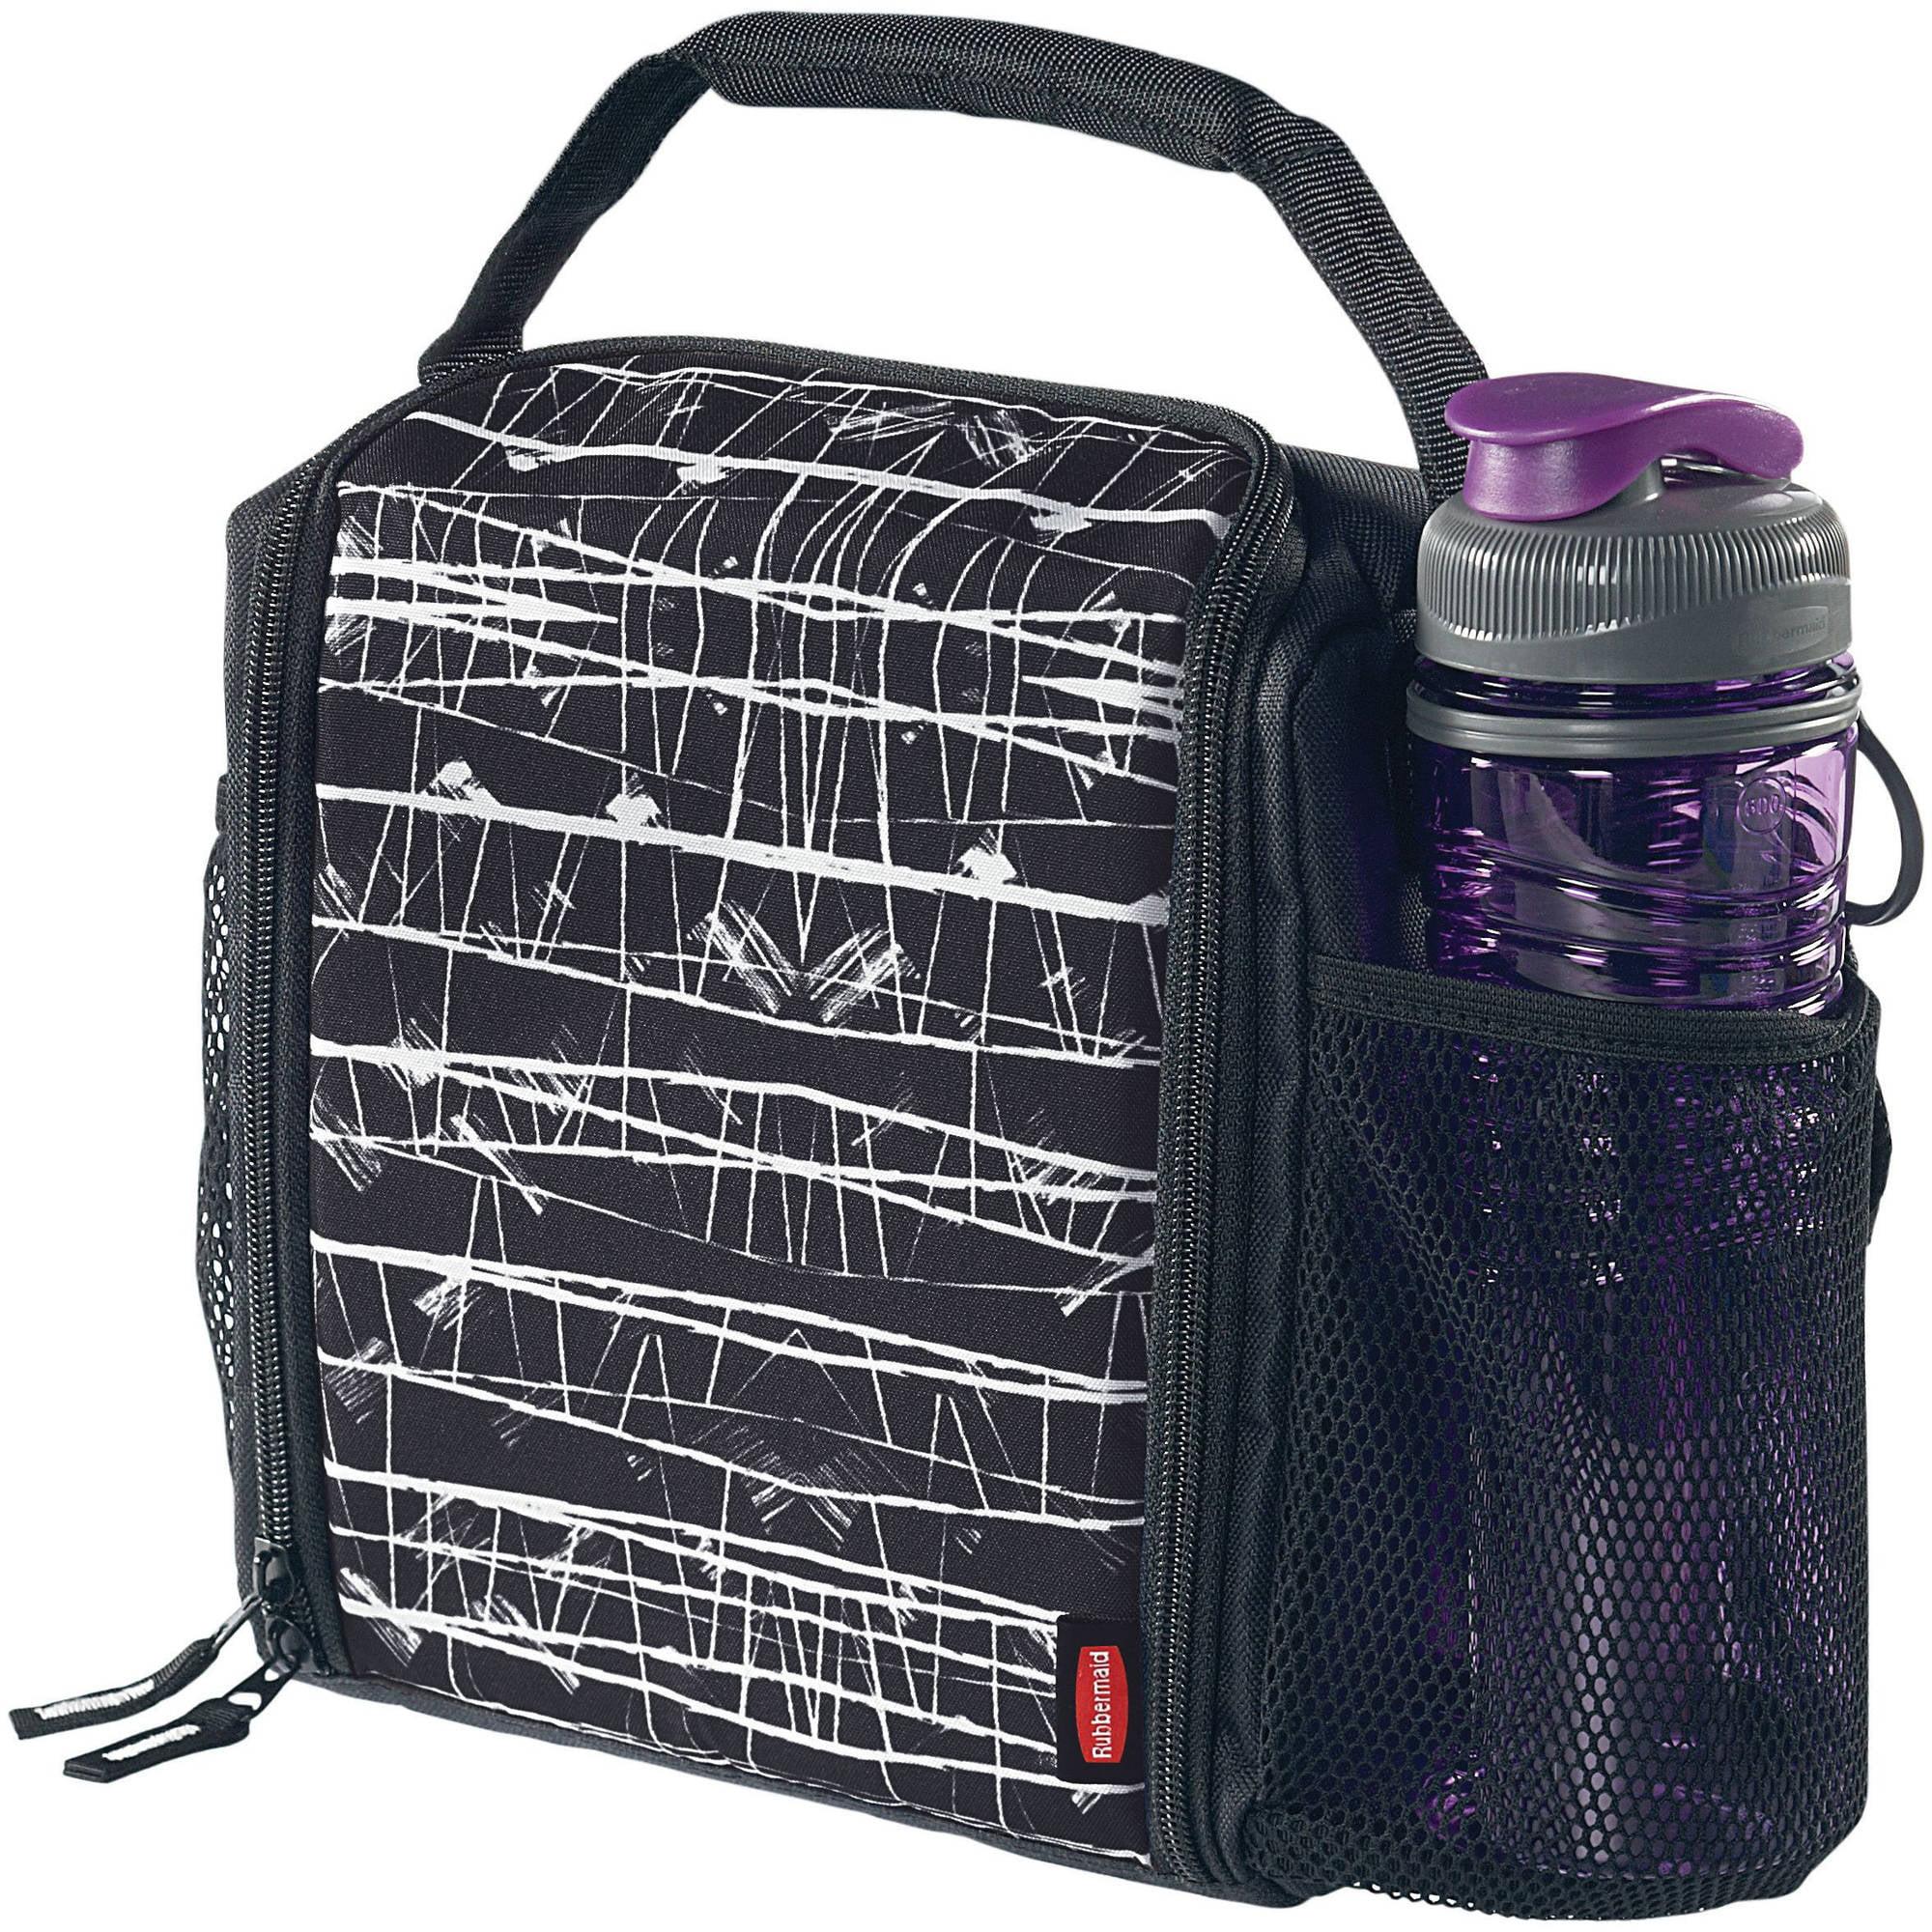 Rubbermaid LunchBlox Medium Durable Lunch Bag, Black Etch